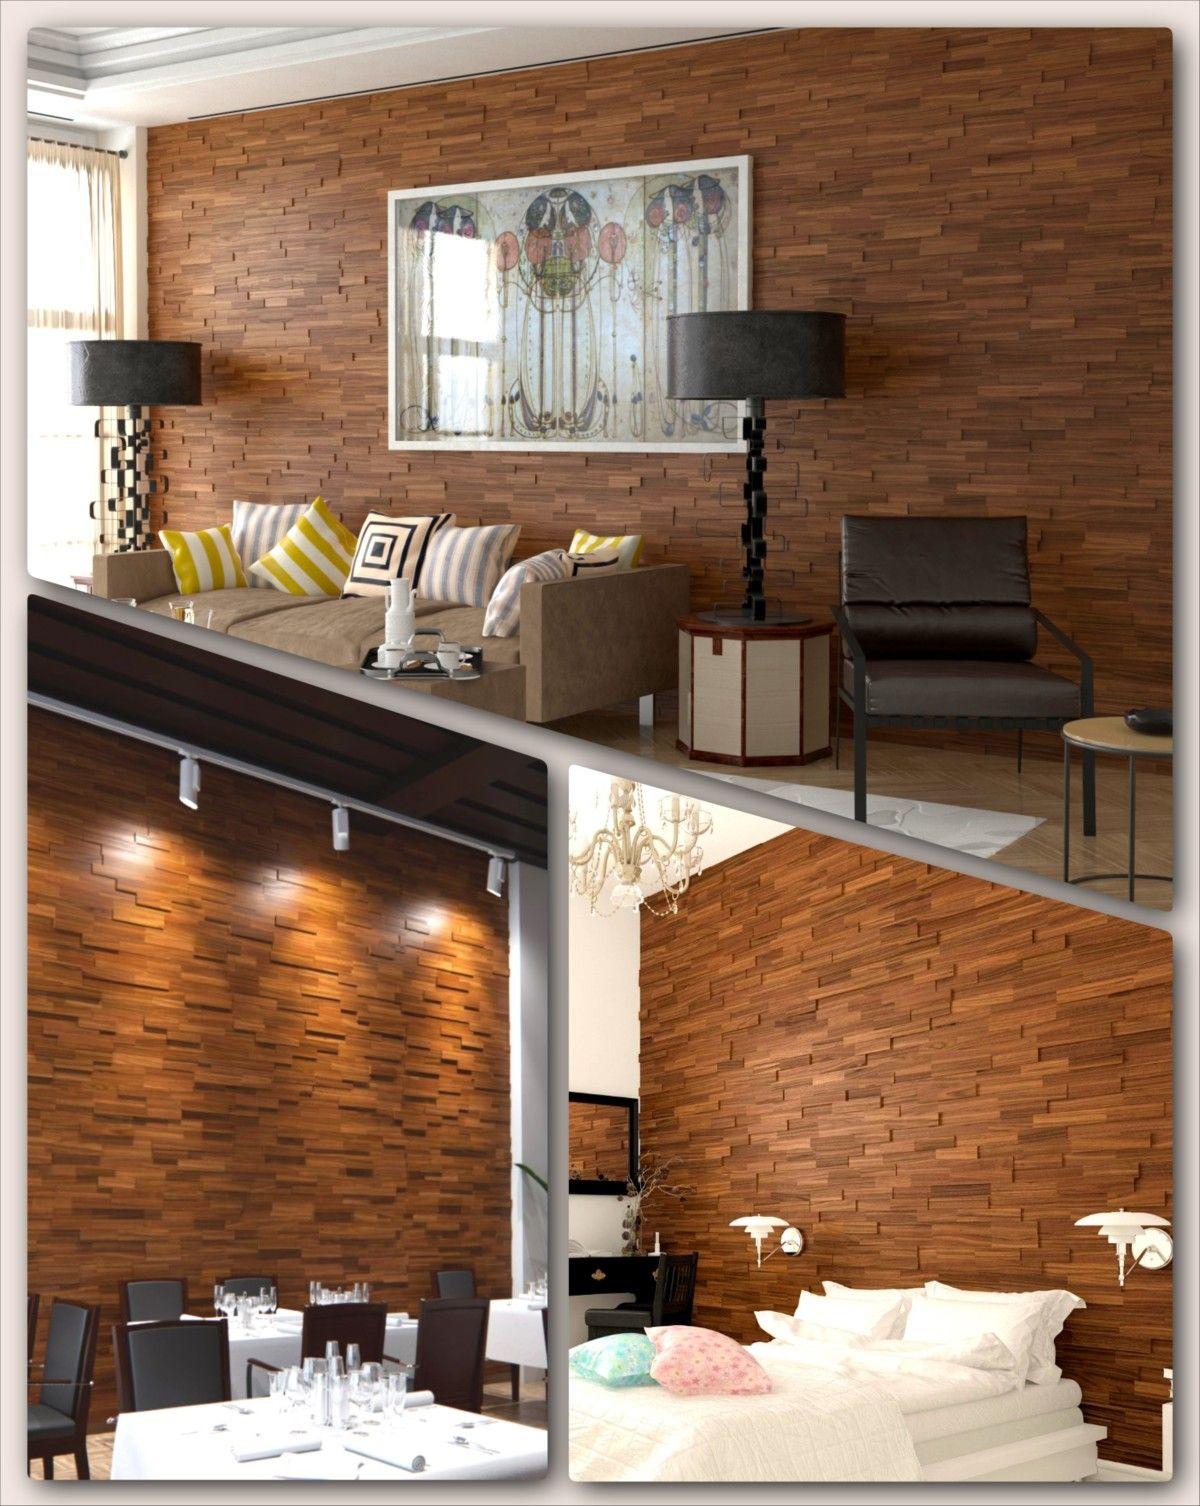 Living Room Walls Wood Panels: Interior 3D Mosaic Wood Wall